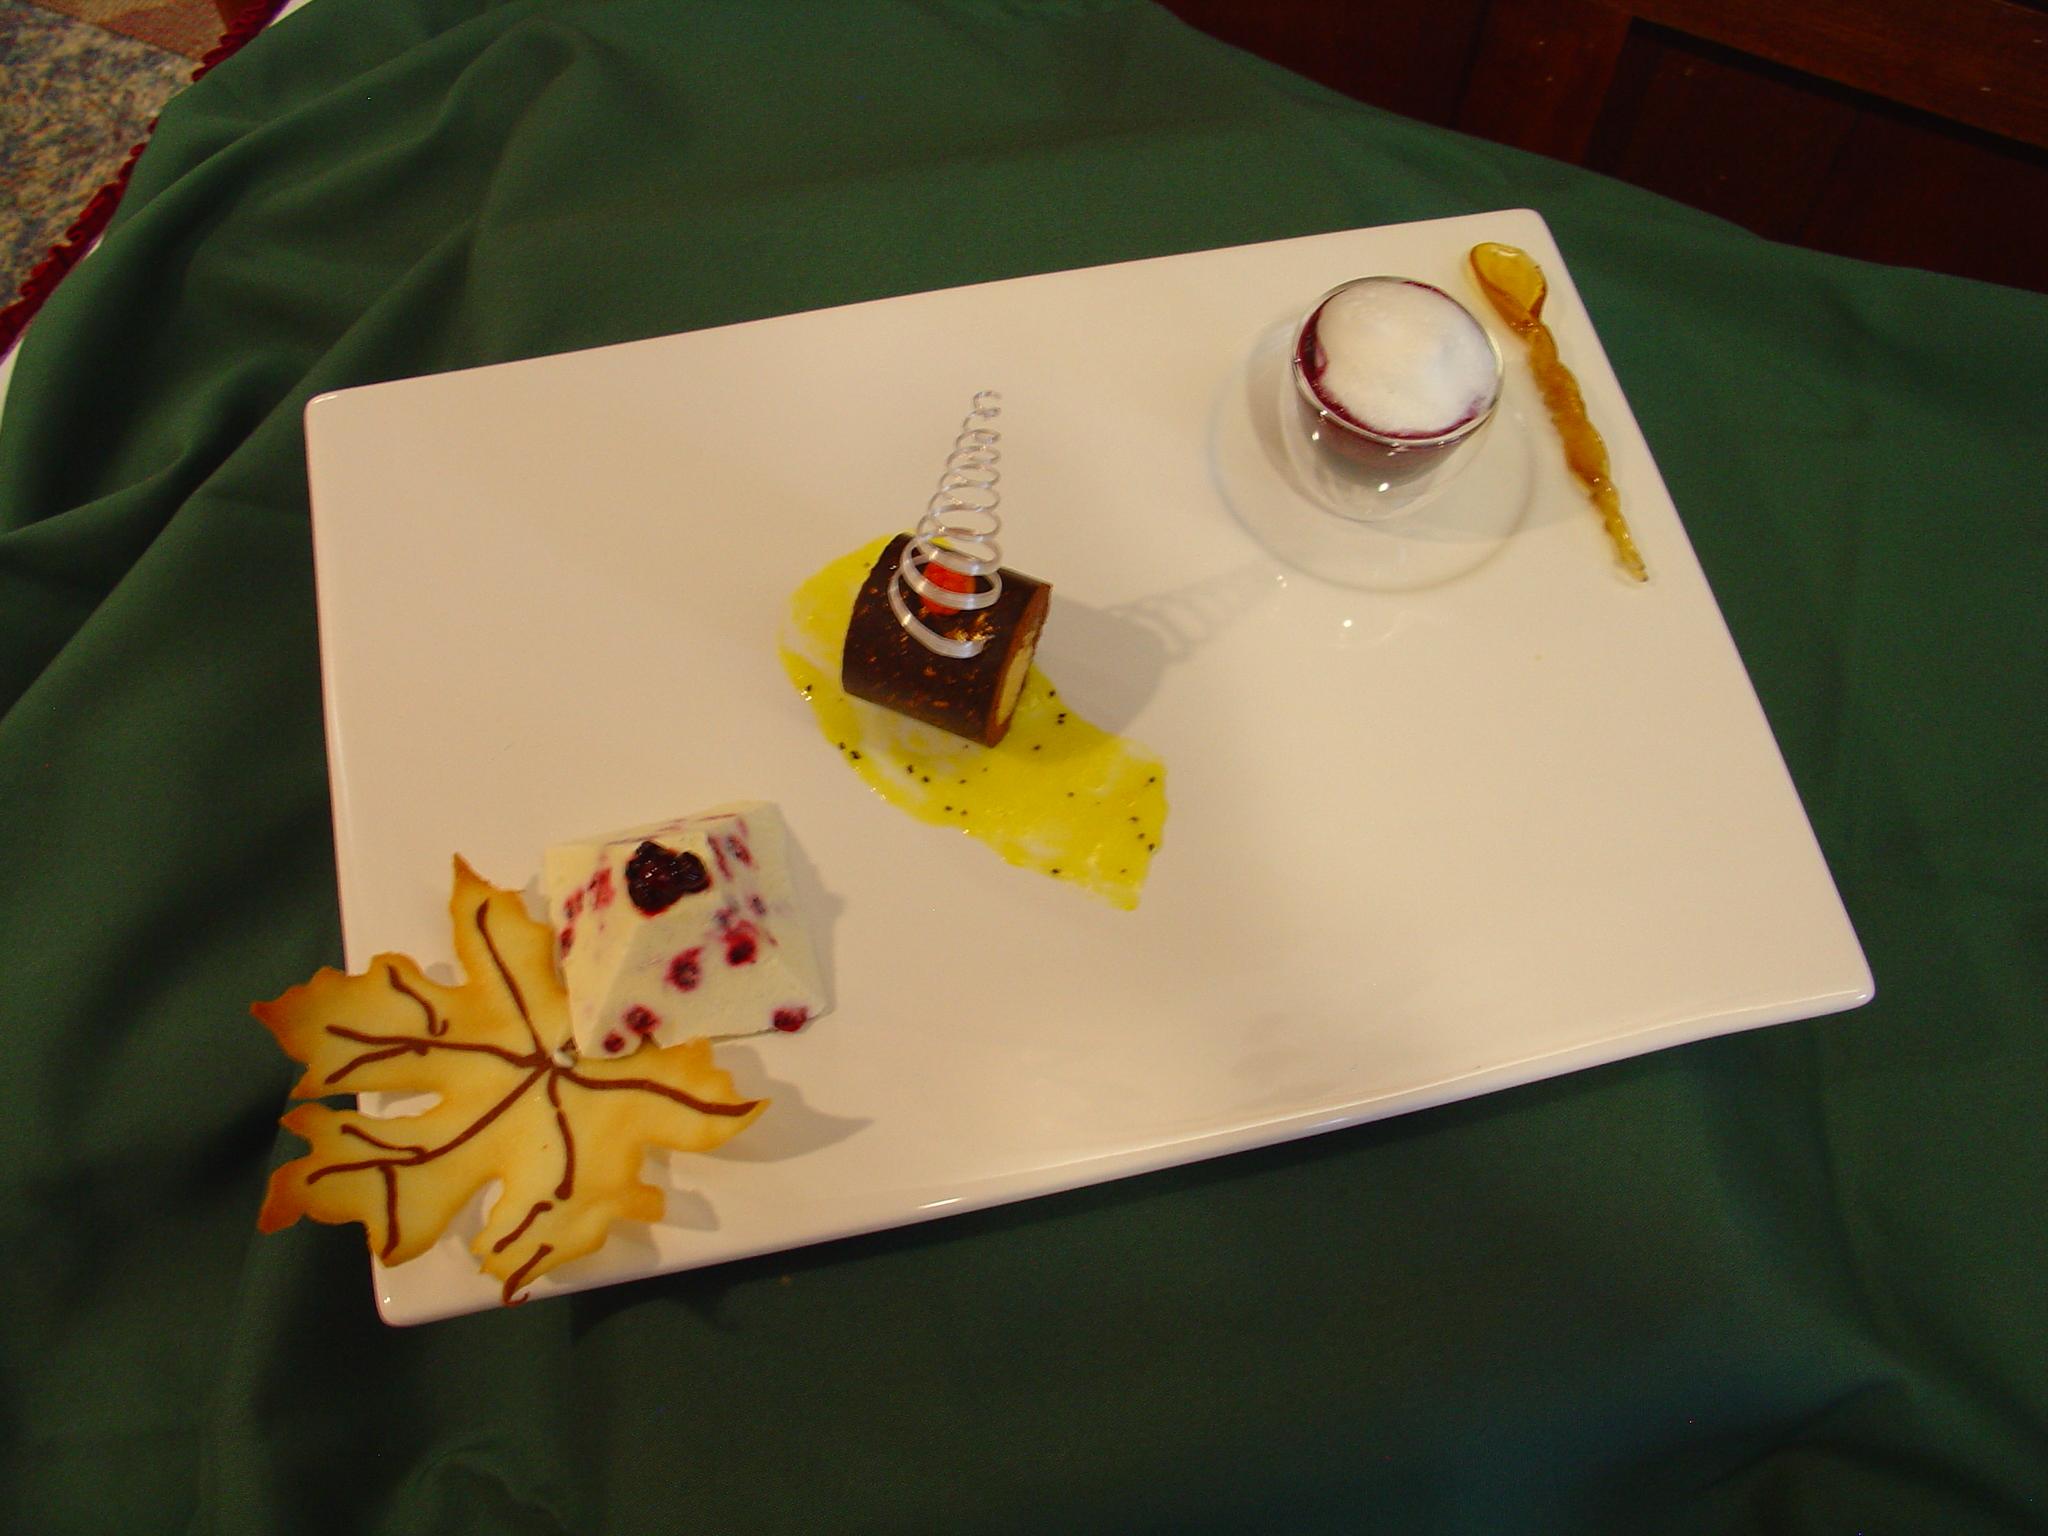 Dessert - Gold medal 2009